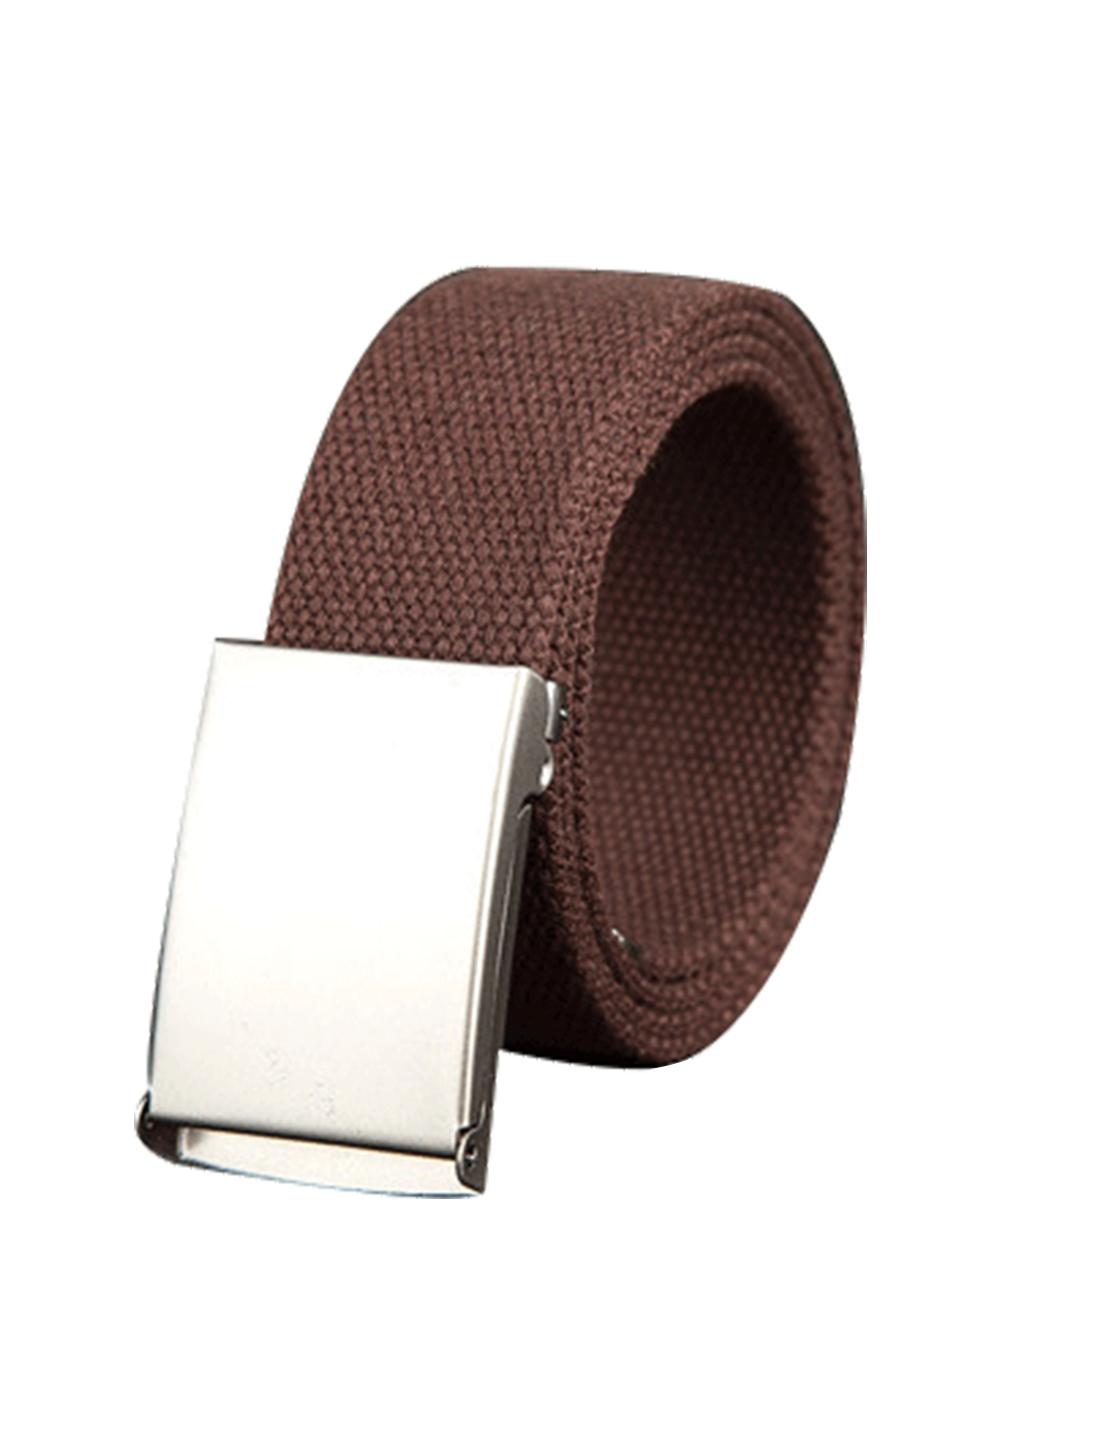 "Unisex Canvas No Hole Slide Metal Buckle Waist Belt Width 1 1/2"" Coffee"